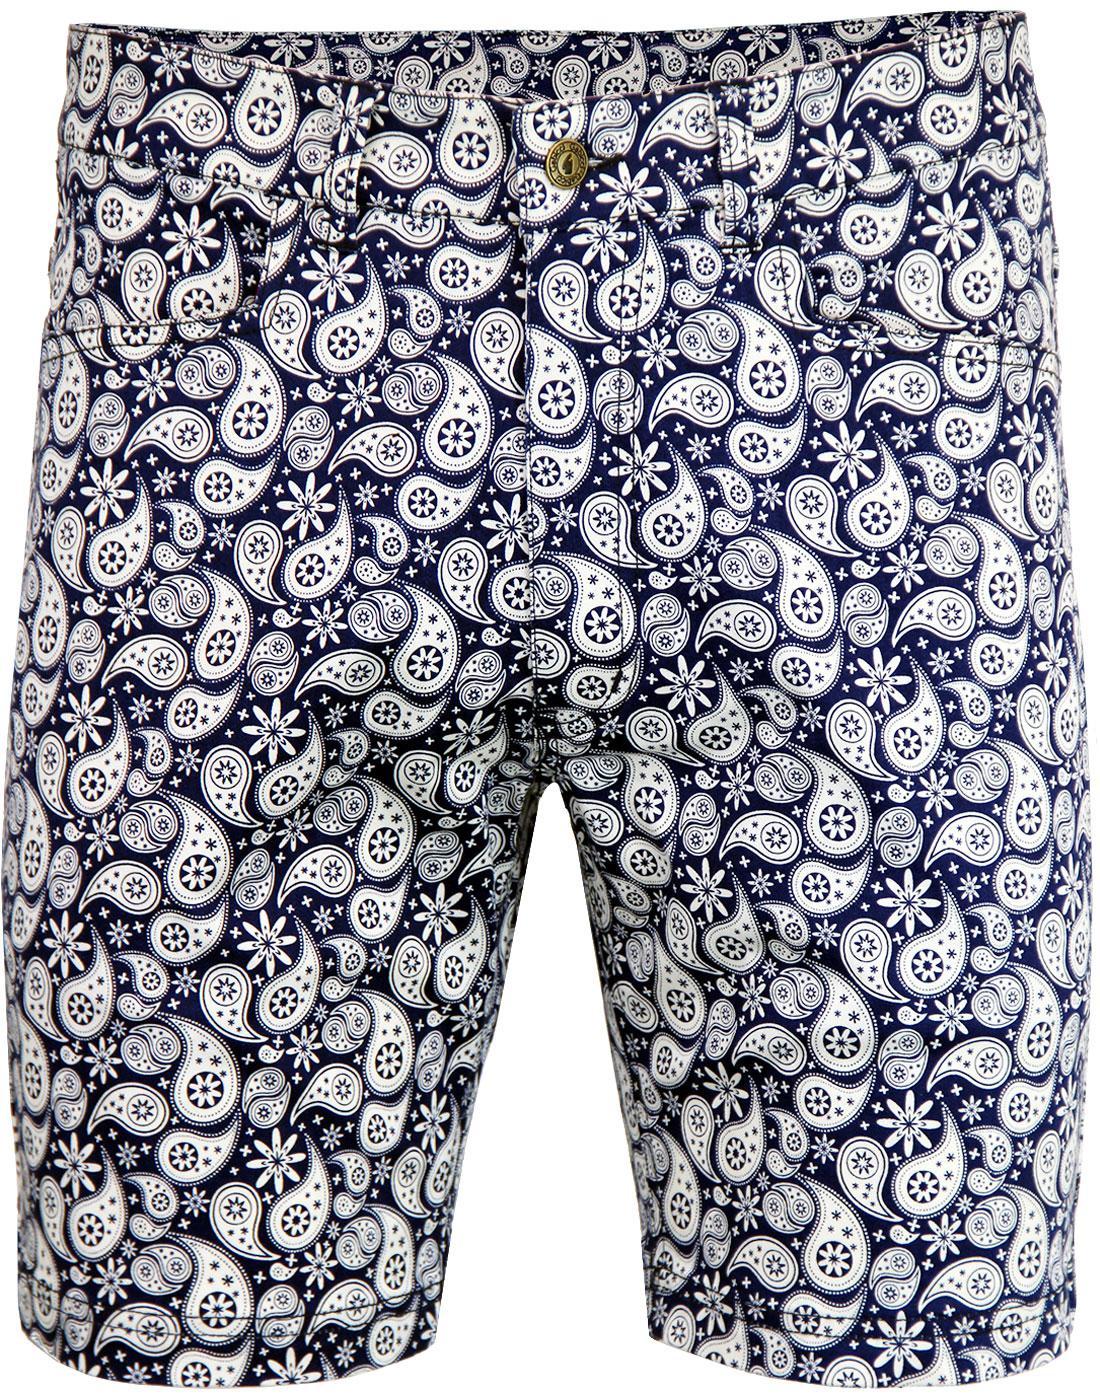 Dalveen GABICCI VINTAGE 60's Paisley Twill Shorts